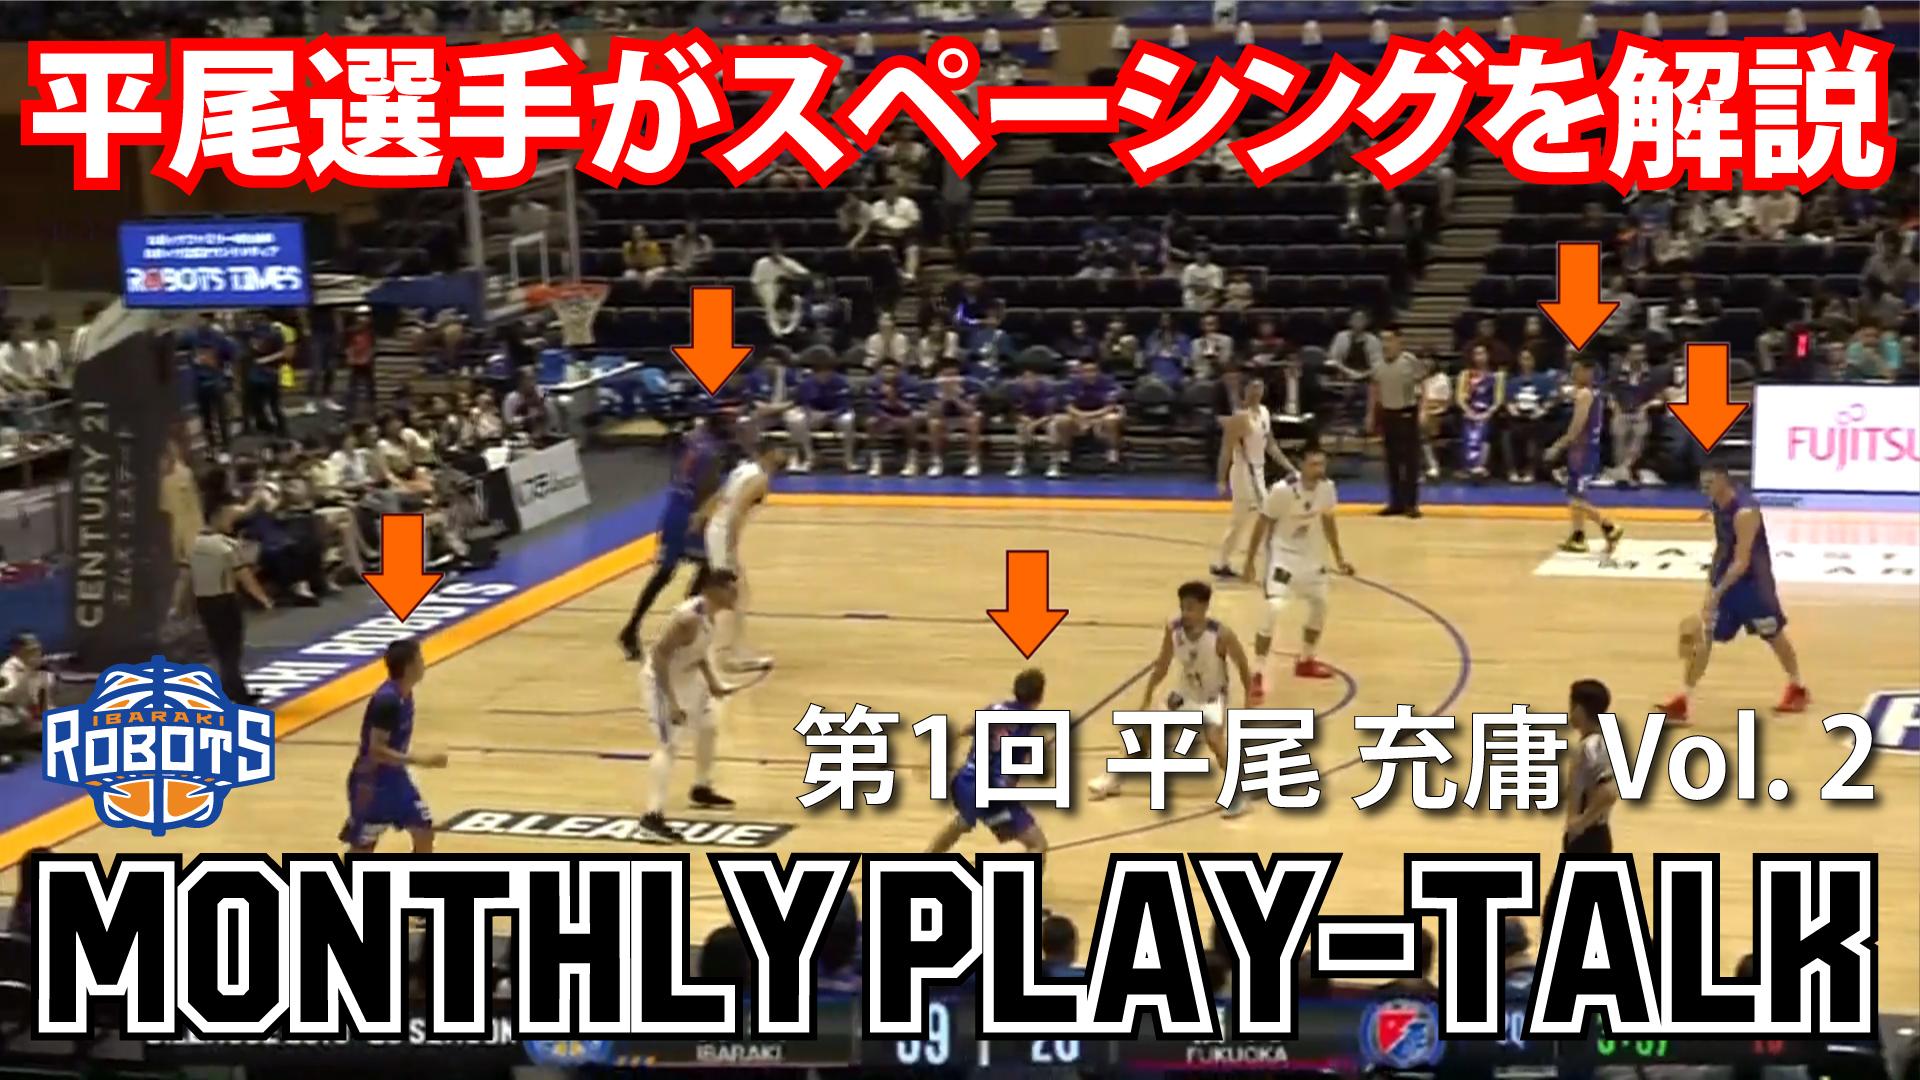 【ROBOTS TV】『MONTHLY PLAY-TALK | 平尾 充庸選手 第1回 Vol.2』